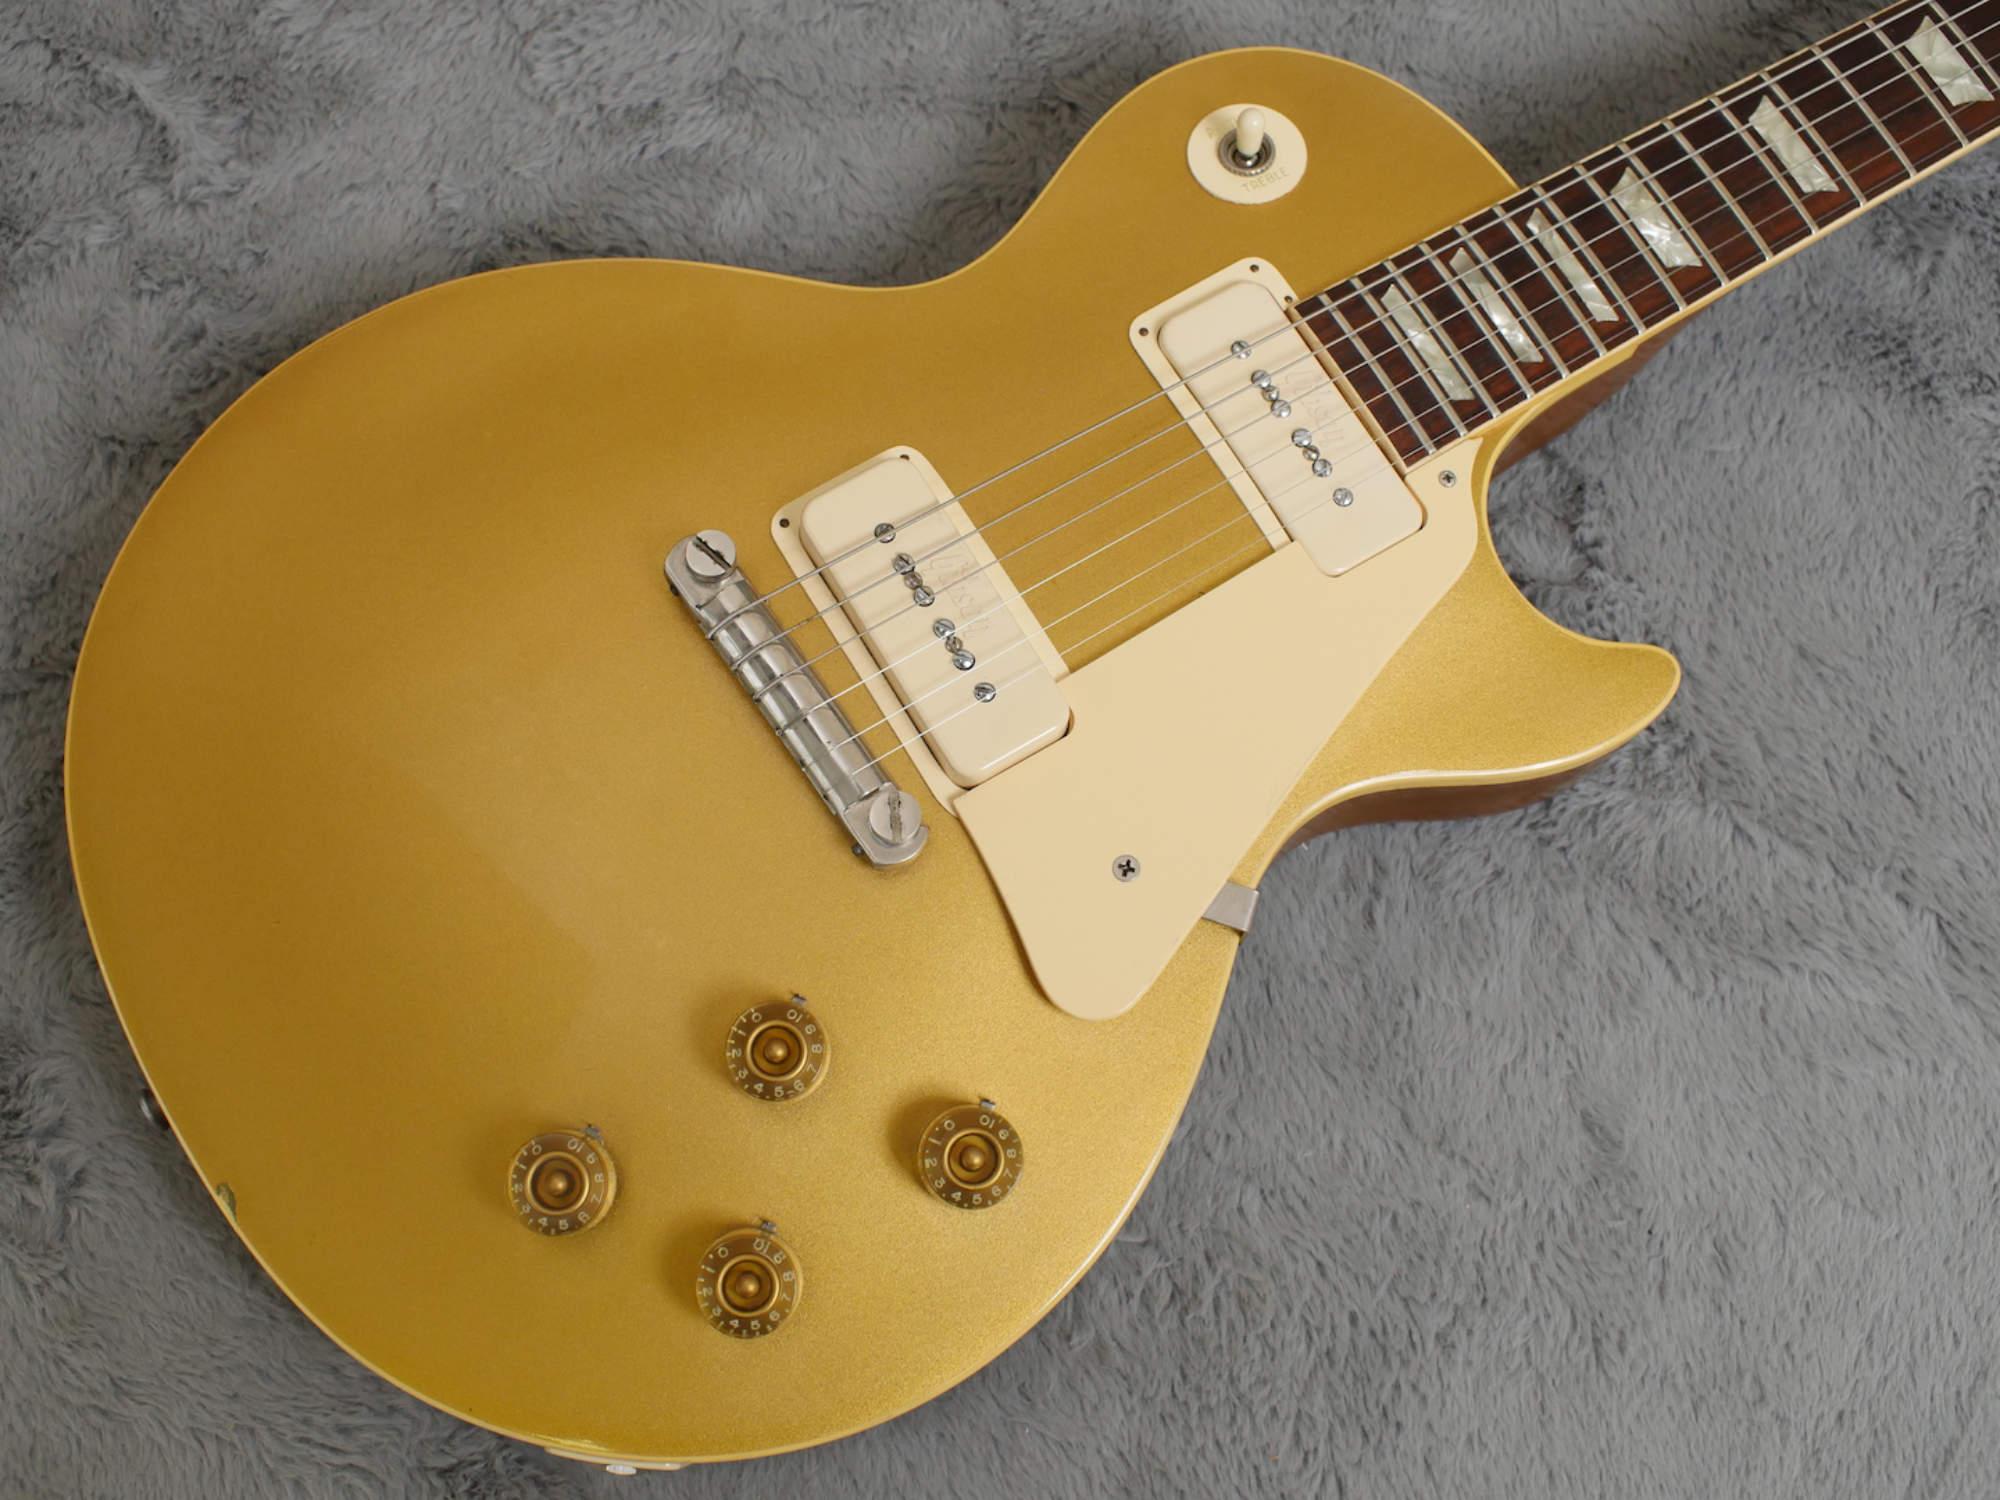 1971 Gibson Les Paul 58 Standard near MINT + OHSC